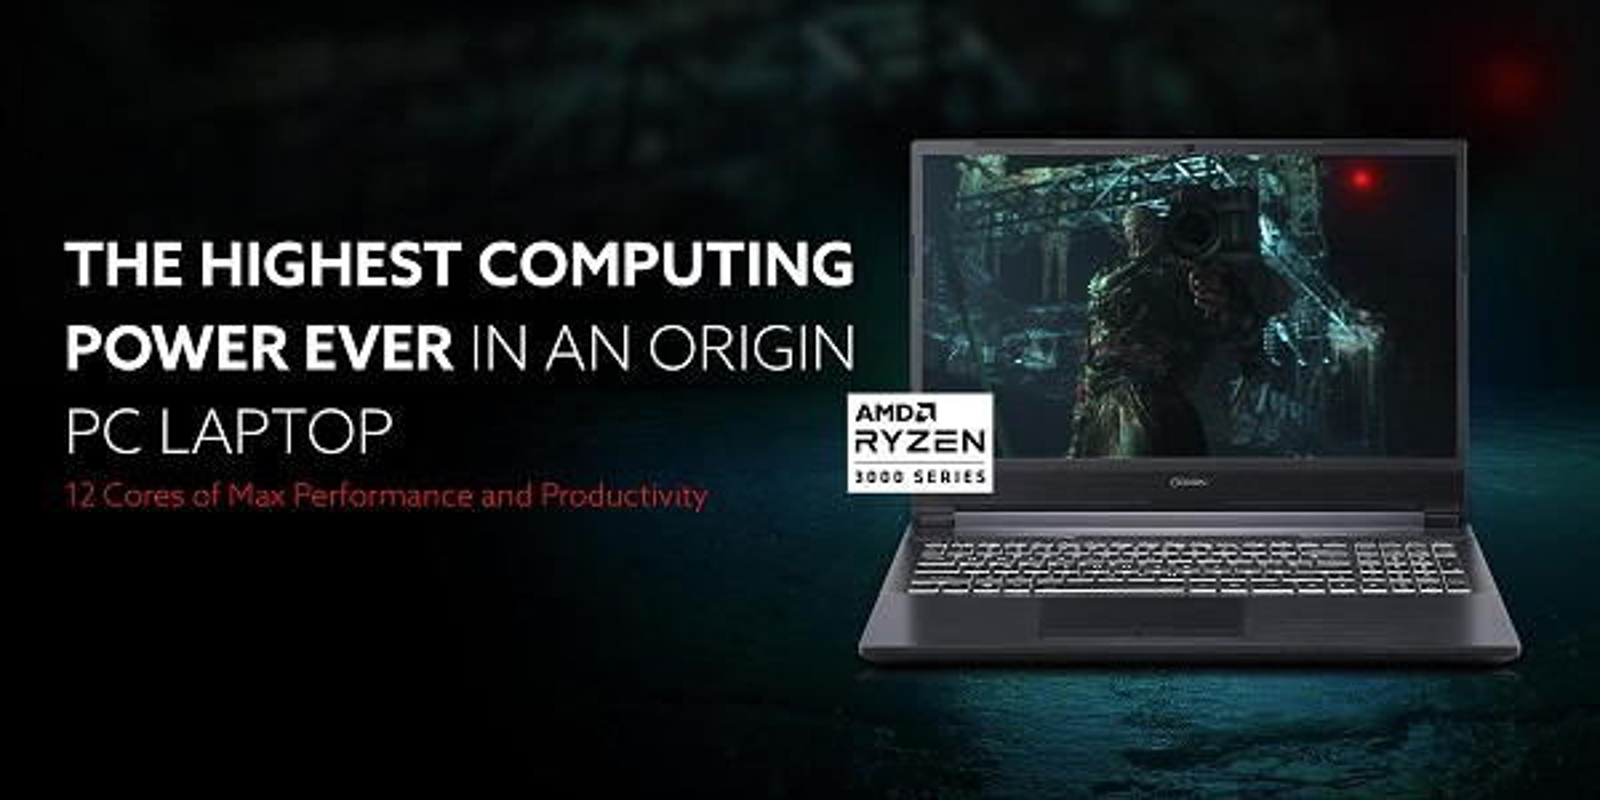 Sieu laptop manh nhat The gioi moi xuat hien, so huu CPU desktop-Hinh-8